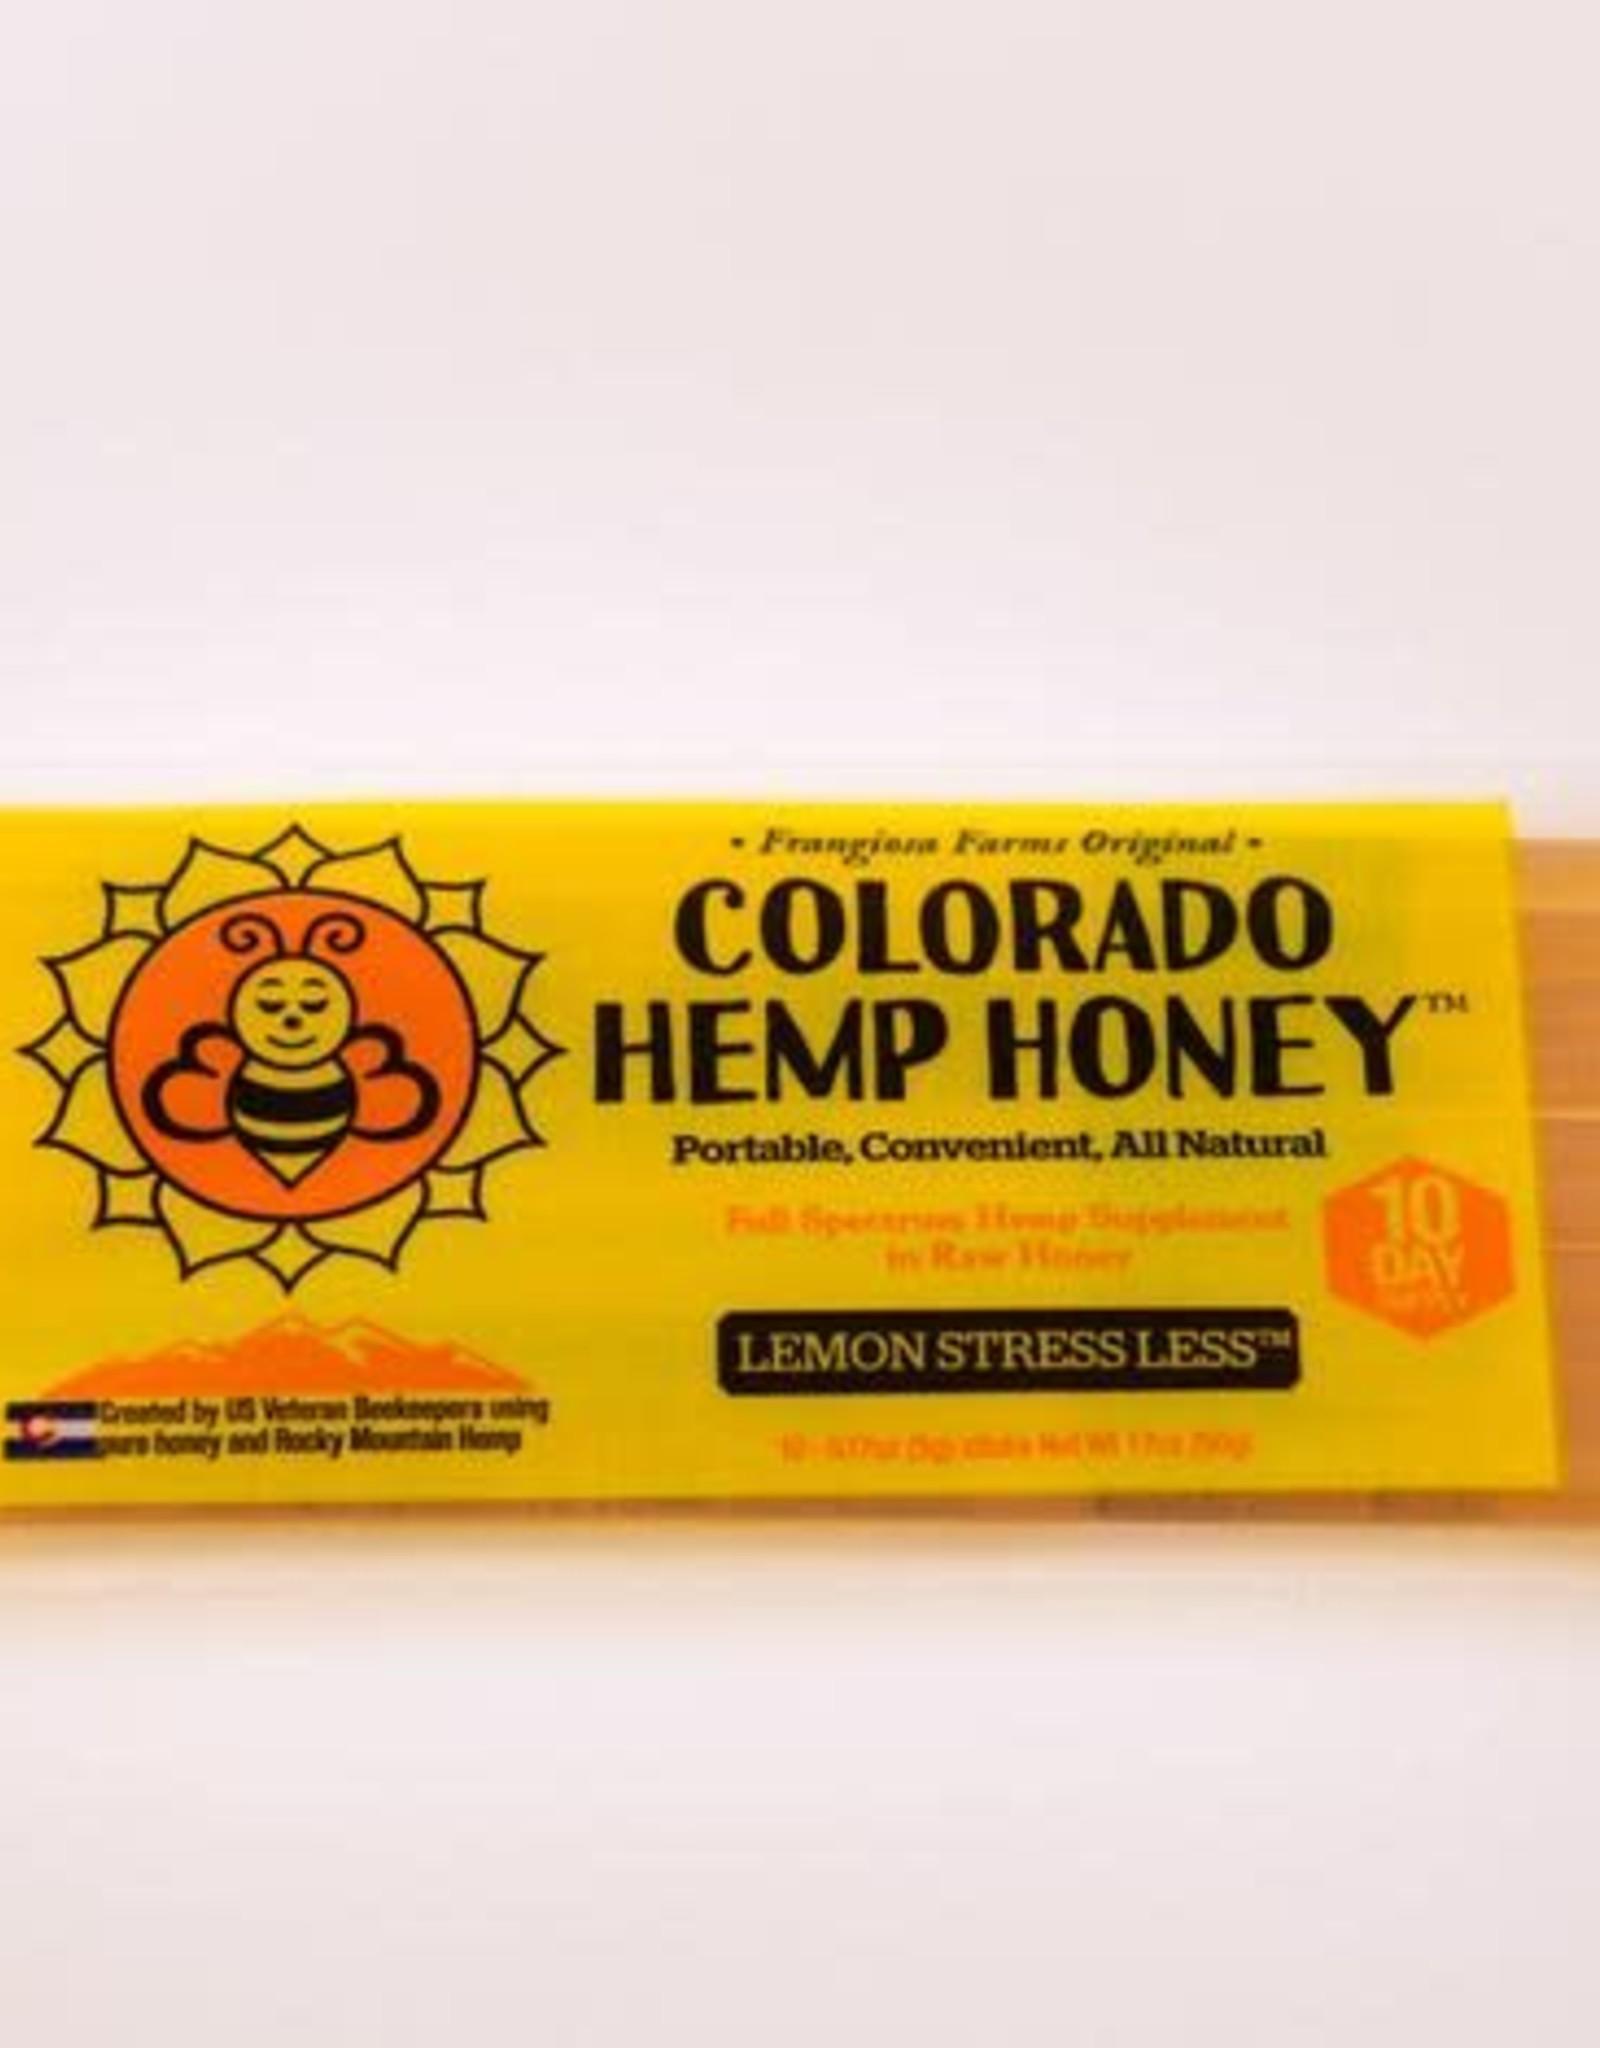 Colorado Hemp Honey Colorado Hemp Honey Lemon Stress Less Stix